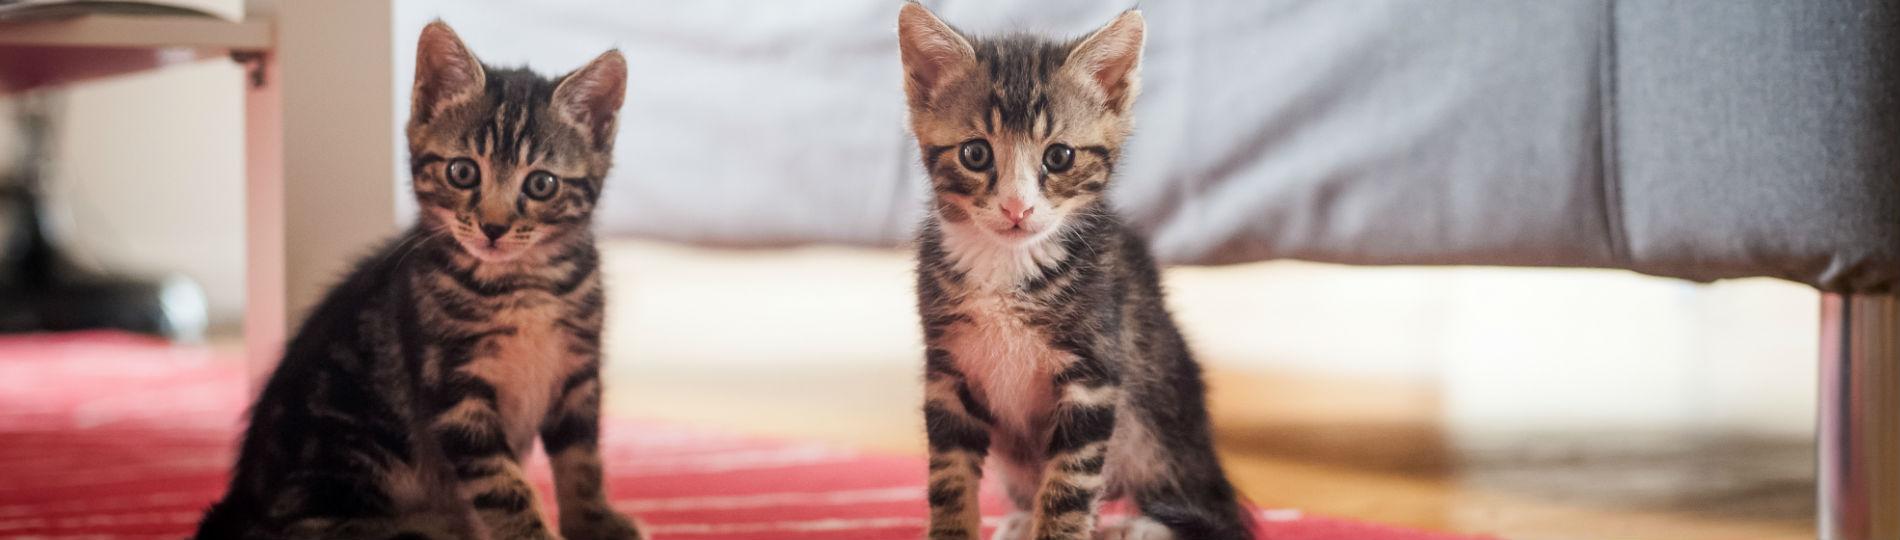 Pet Communications Felines